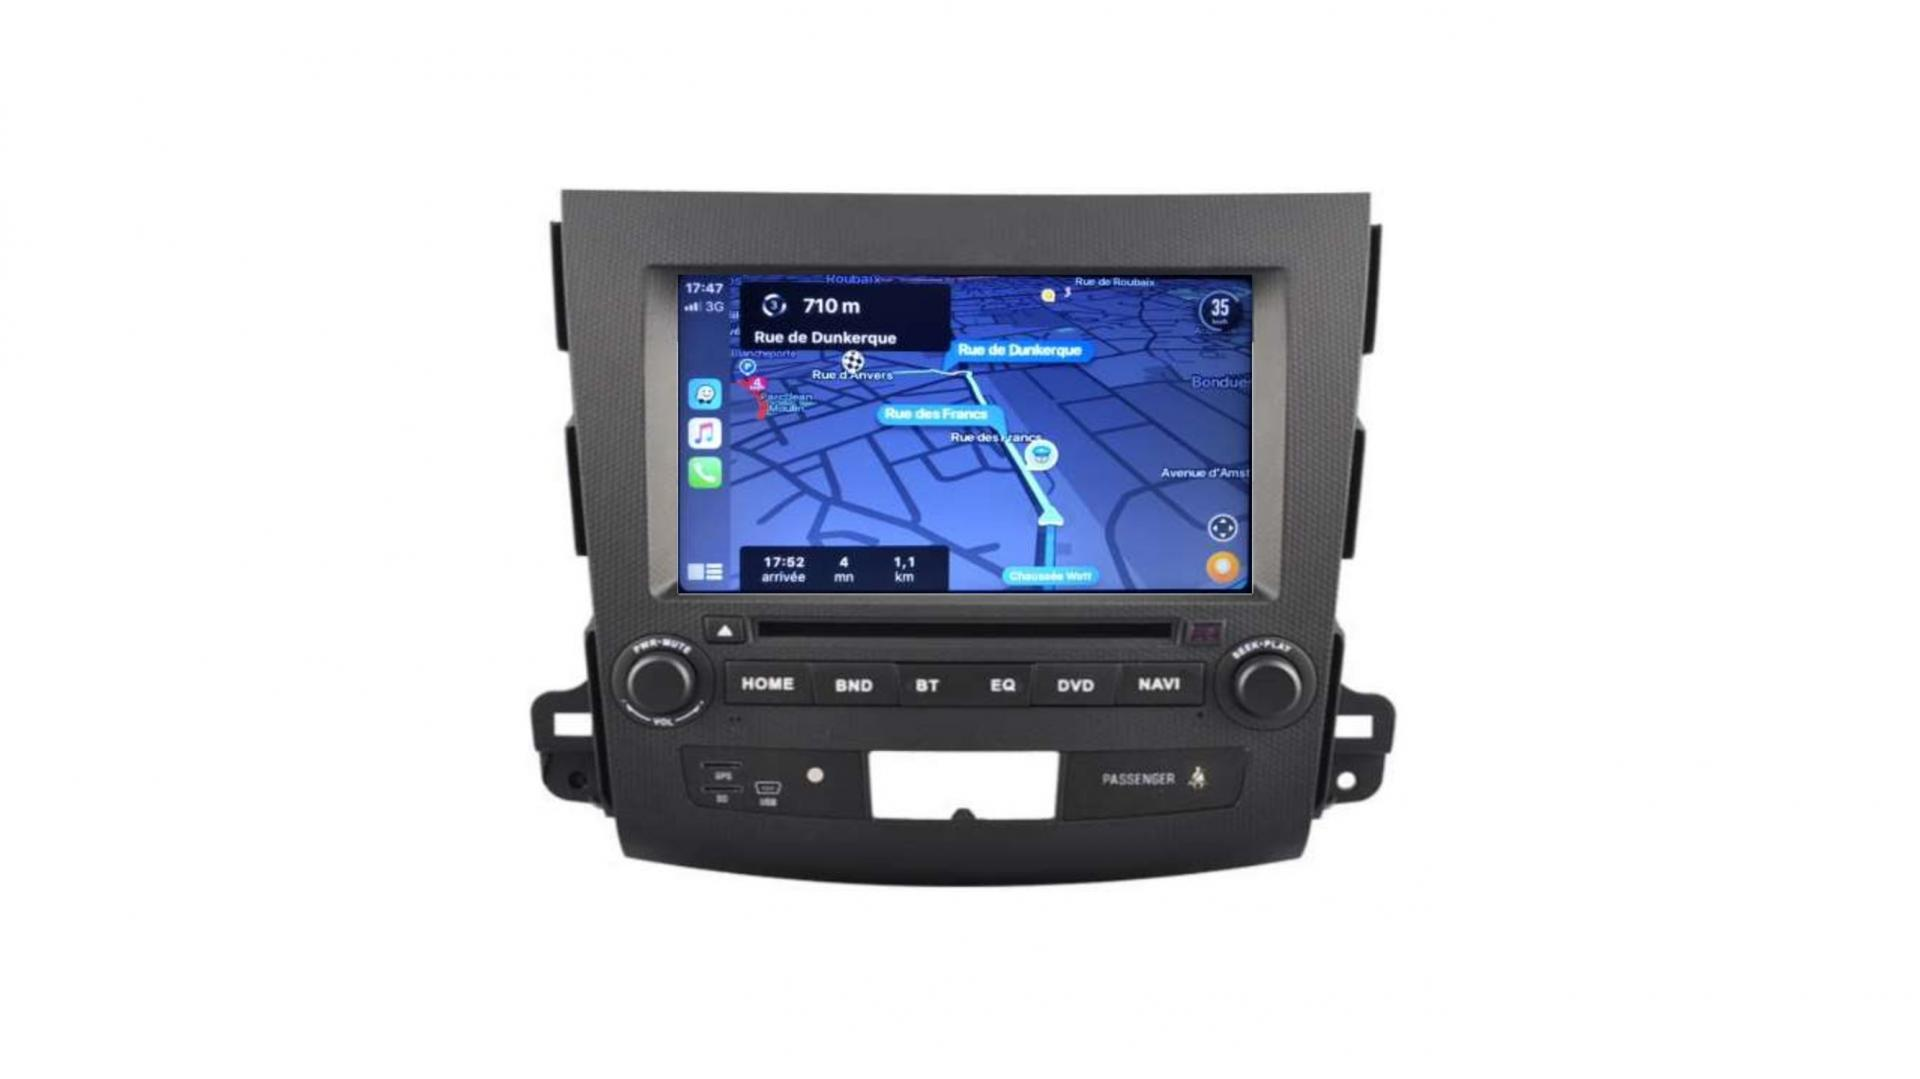 Autoradio gps bluetooth peugeot 4007 android auto carplay camera de recul commande au volant3